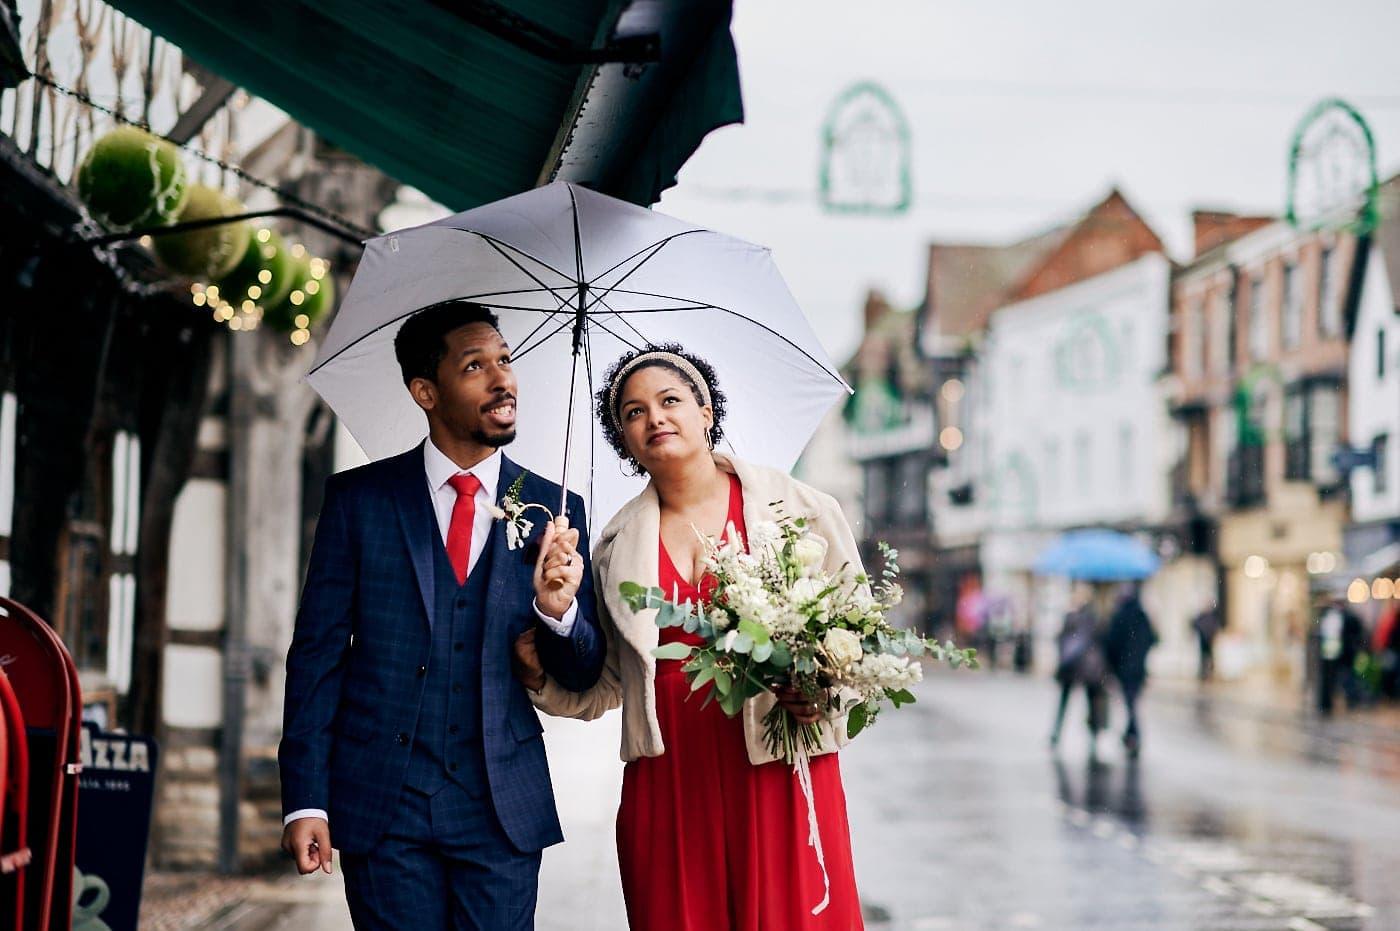 Bride and groom under umbrella as they walk through Stratford-upon-Avon streets